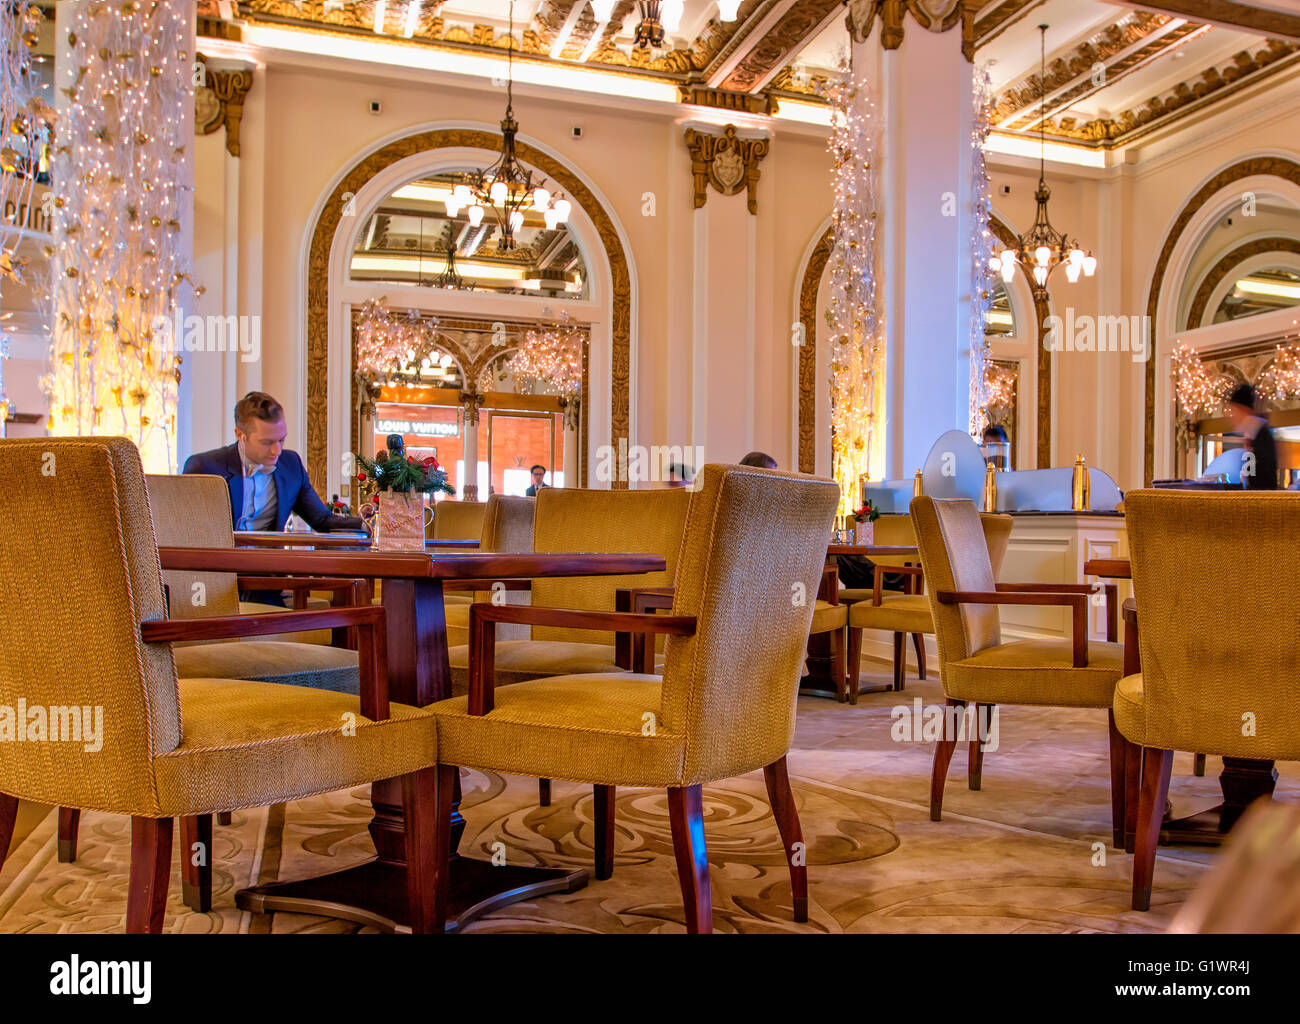 Lobby of Peninsula hotel in Hong Kong - Stock Image